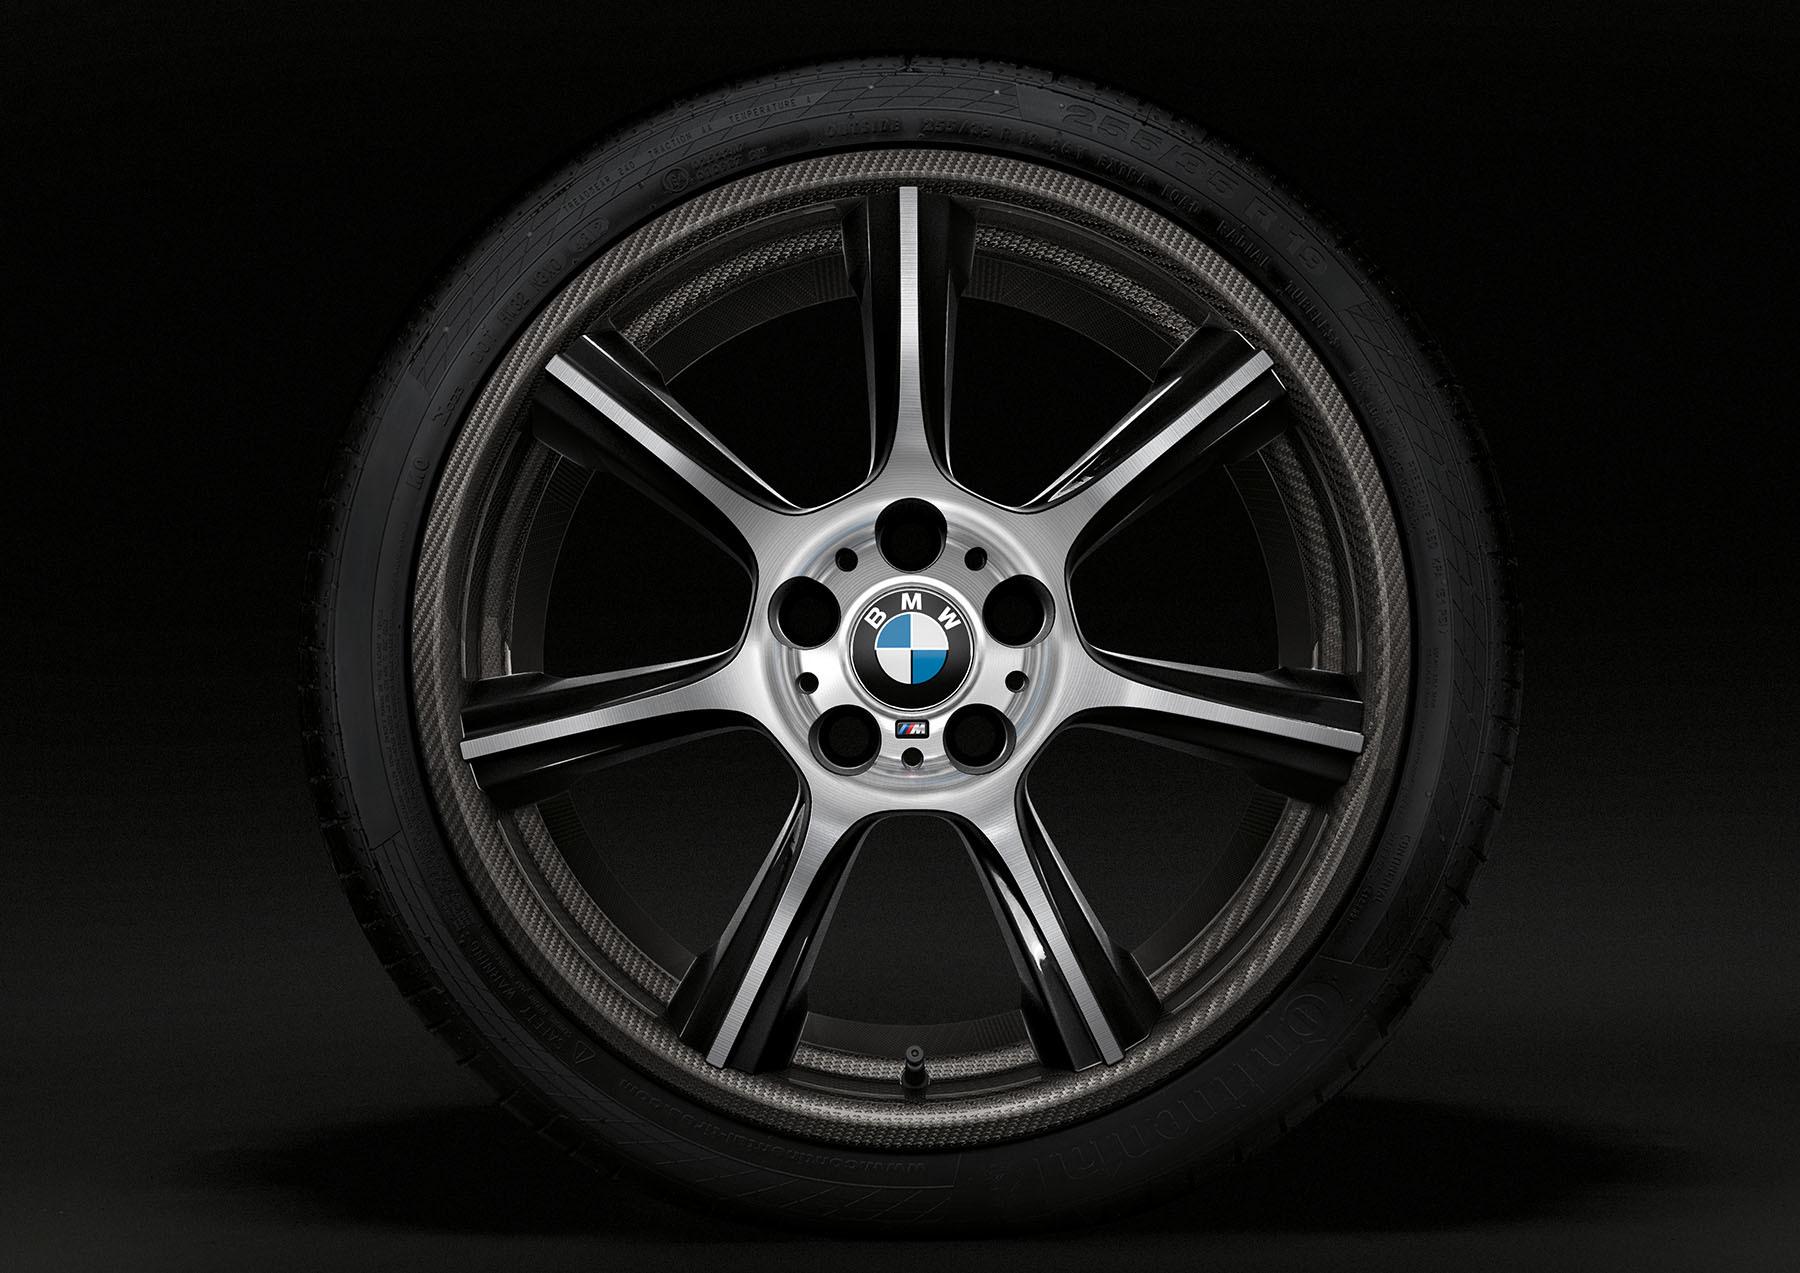 Foto de BMW M4 GTS rines de fibra de carbono (2/3)